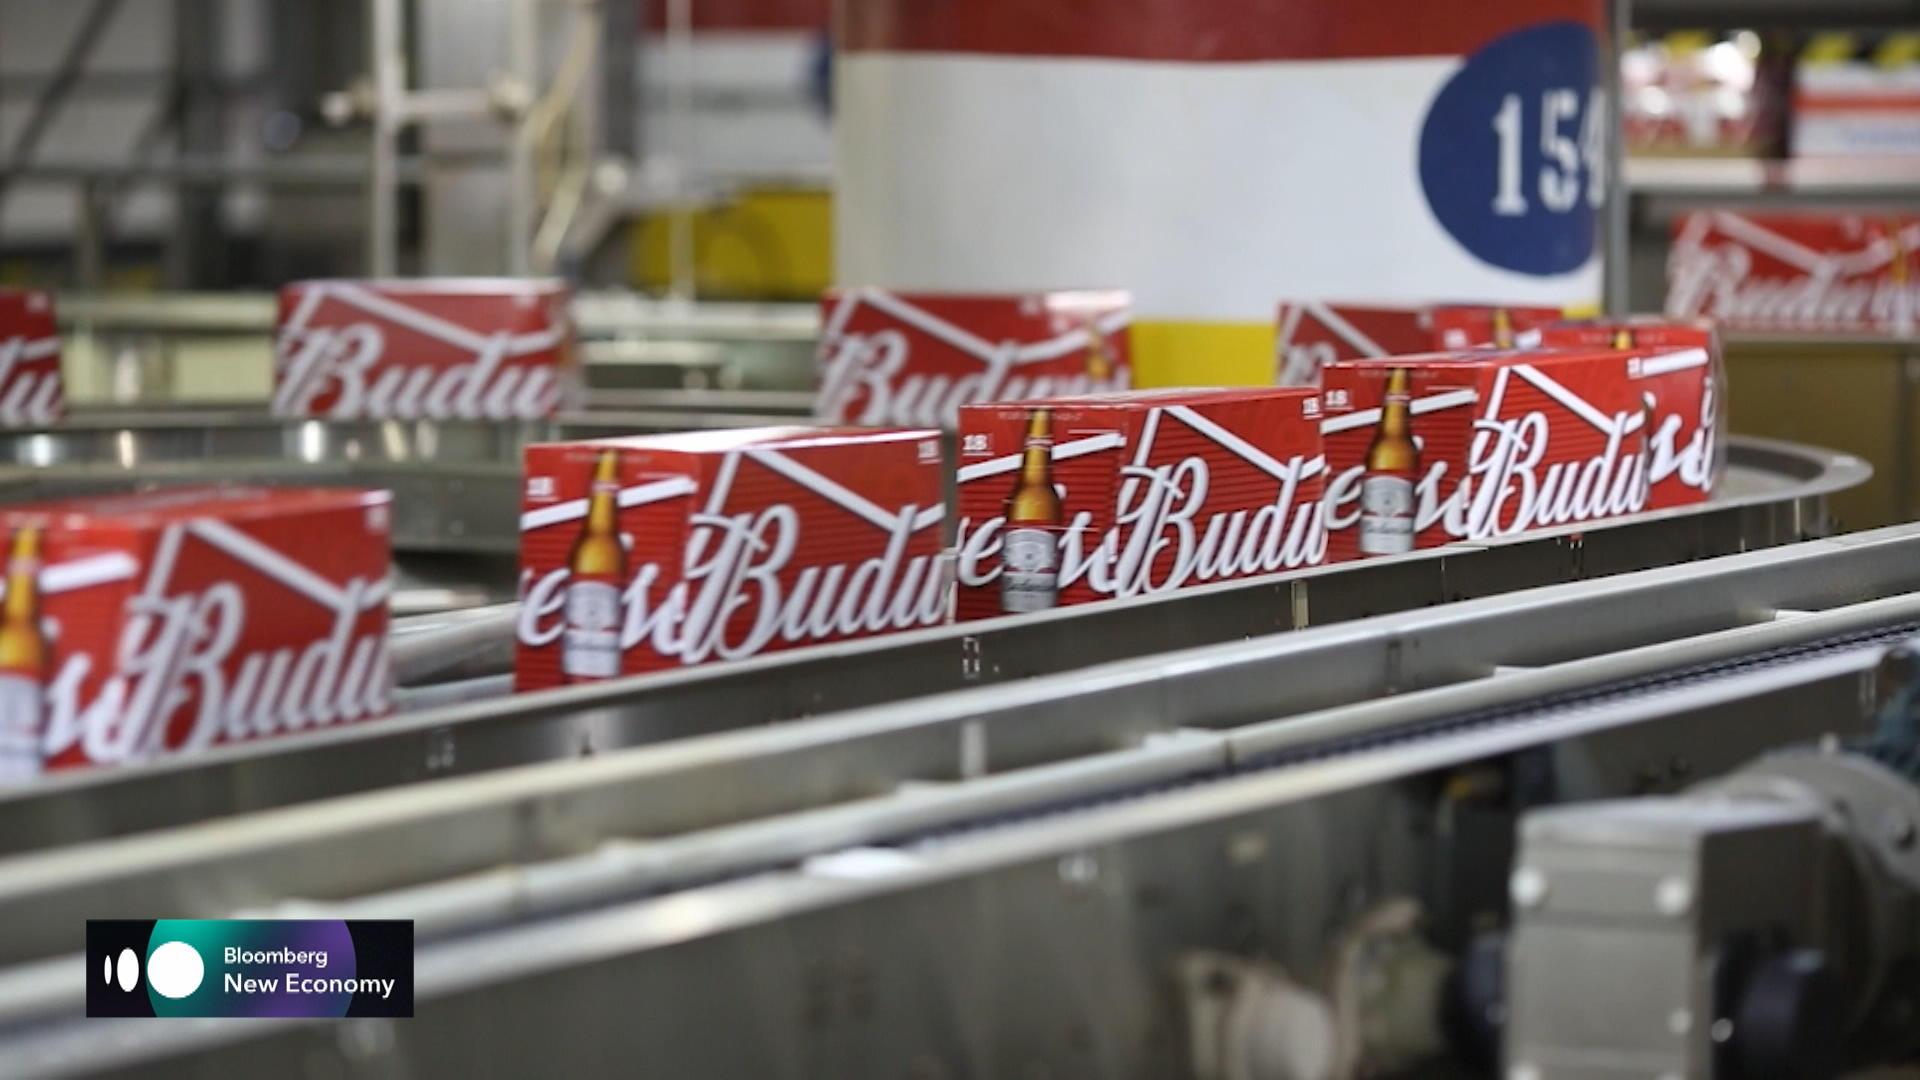 Budweiser-Maker AB InBev Says Selling Premium Beer in China Is Very Profitable